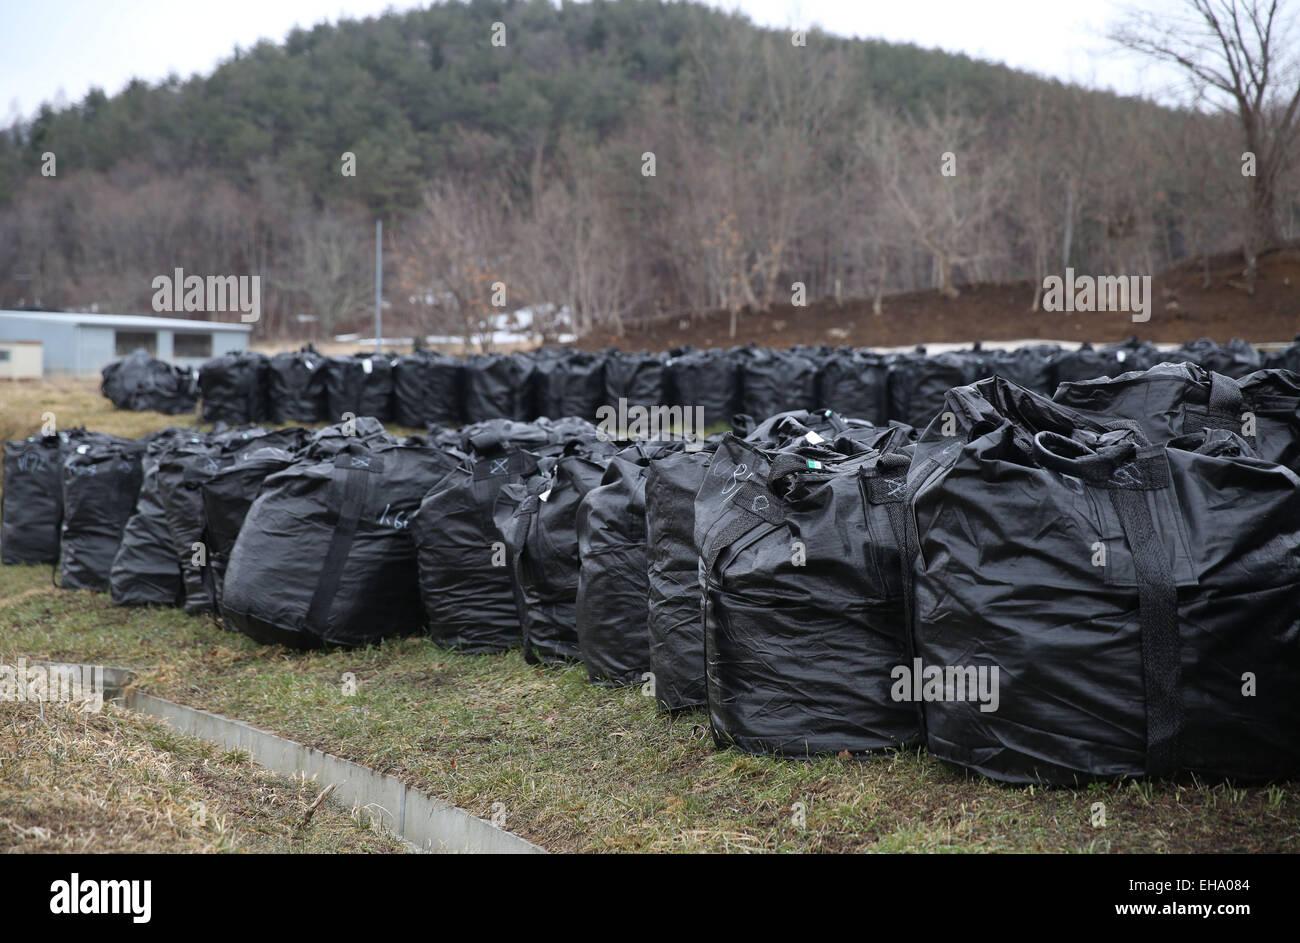 (150310) -- FUKUSHIMA, March 10, 2015 (Xinhua) -- Black bags containing buildup of contaminated wastes are seen - Stock Image